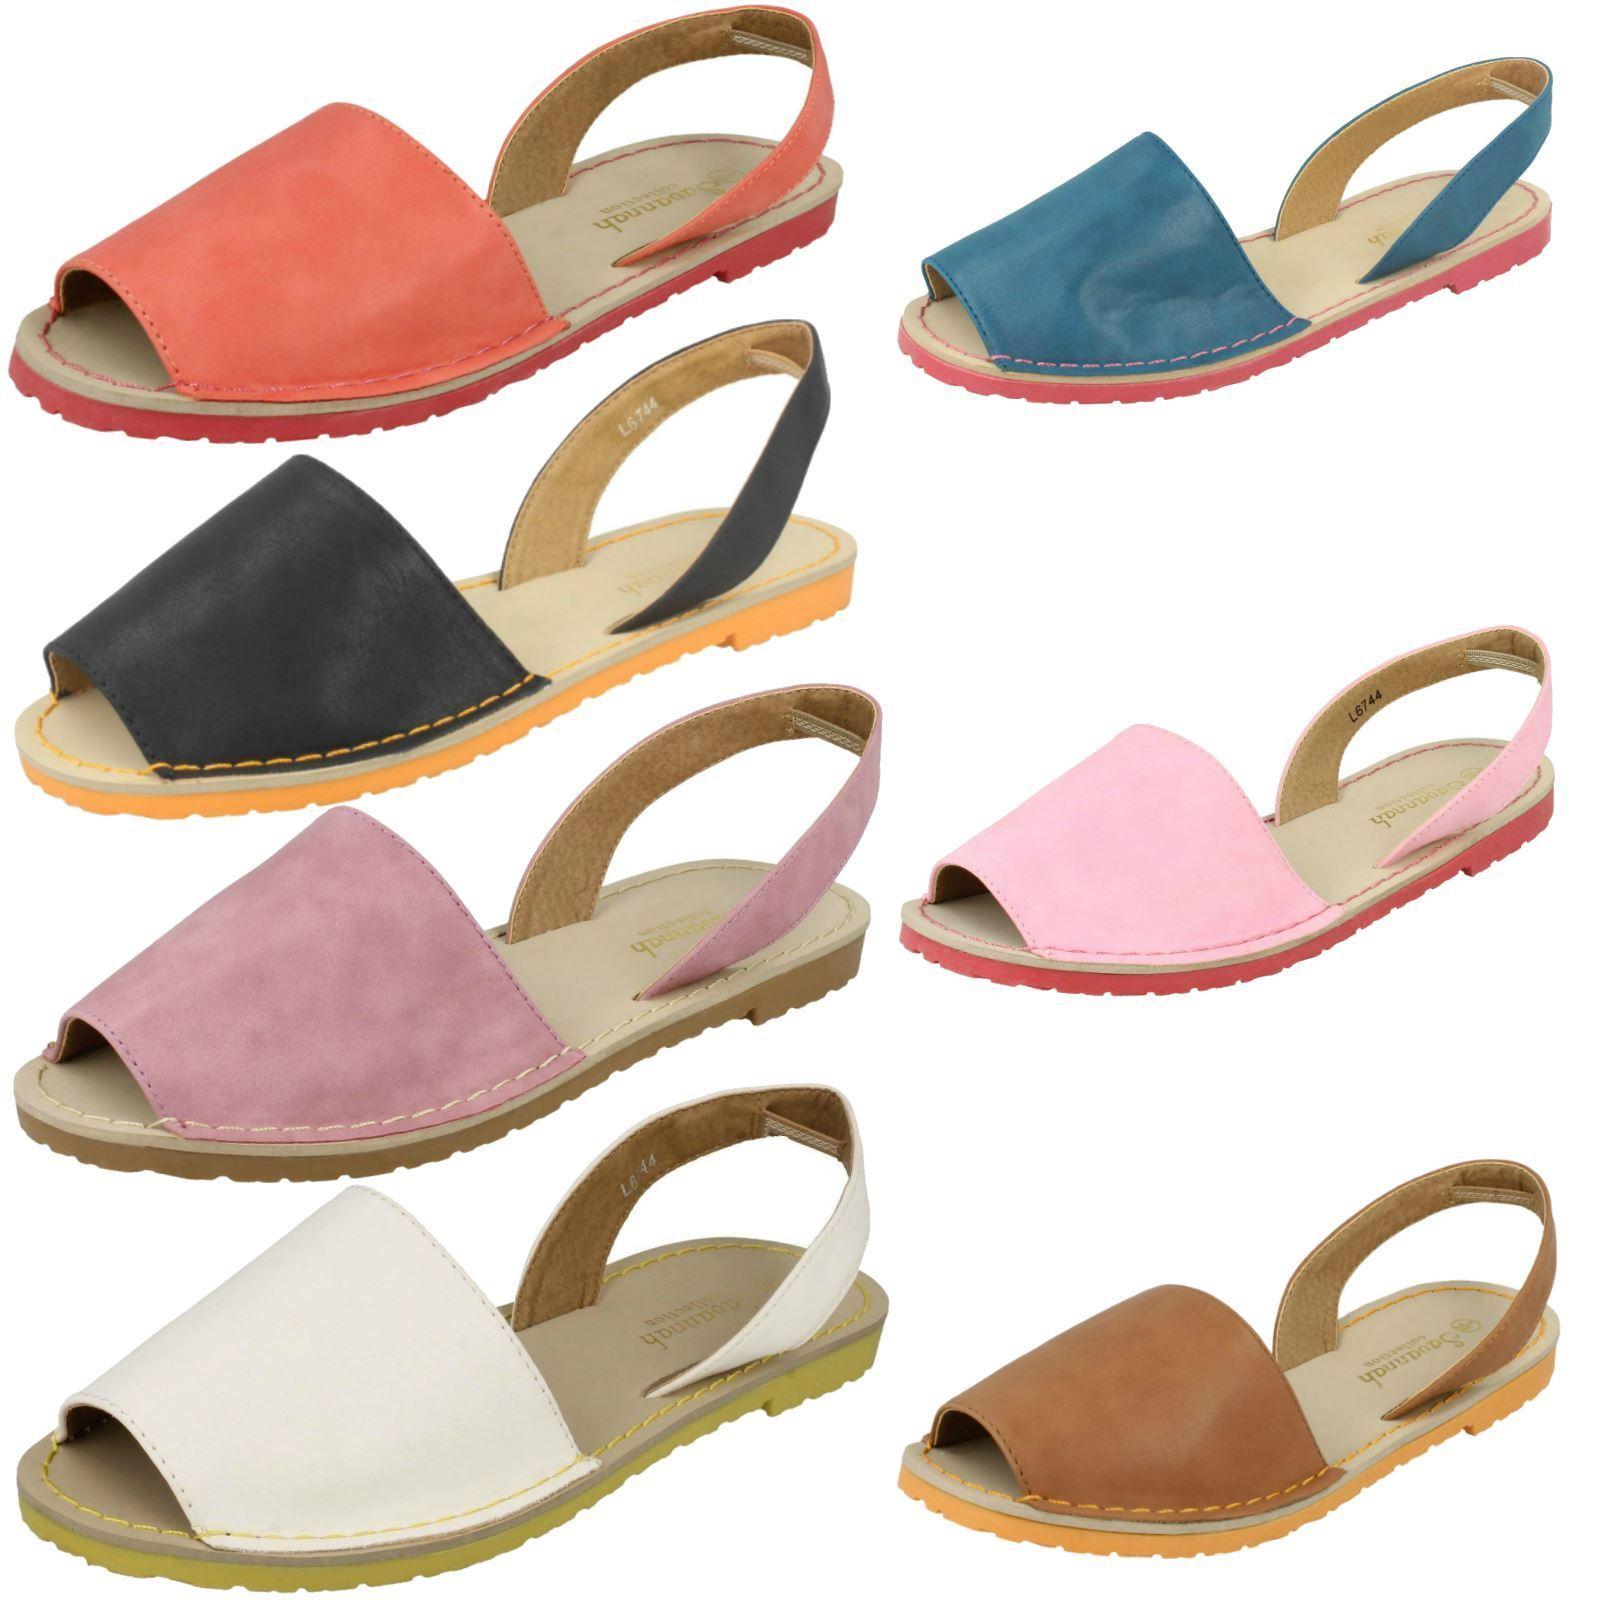 Men/Women Win Ladies Savannah Flat Slingback Sandals online sale Win Men/Women highly appreciated Direct business e39e9d